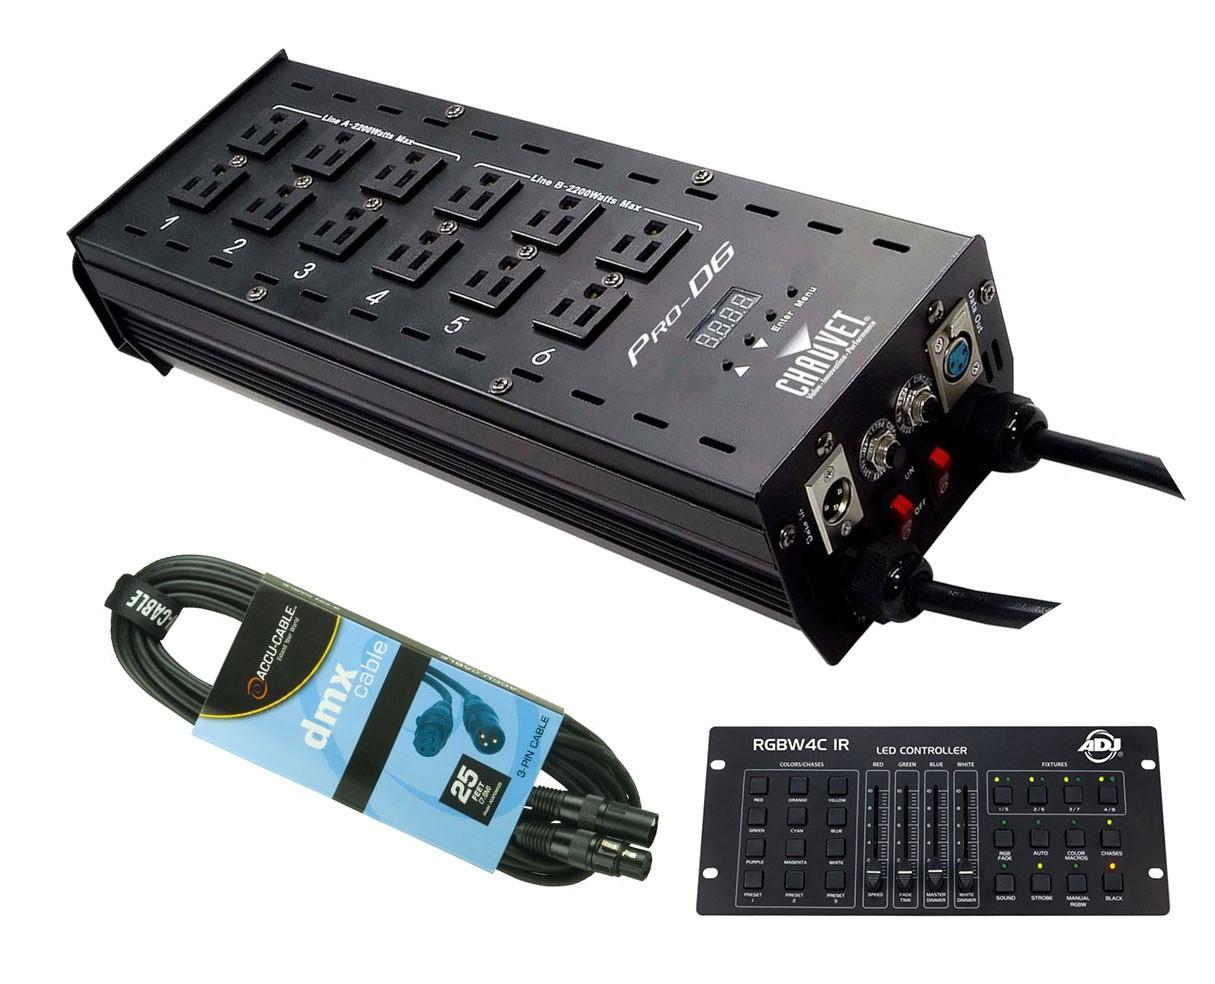 CHAUVET DJ Pro-D6 + RGBW4C IR + Cable